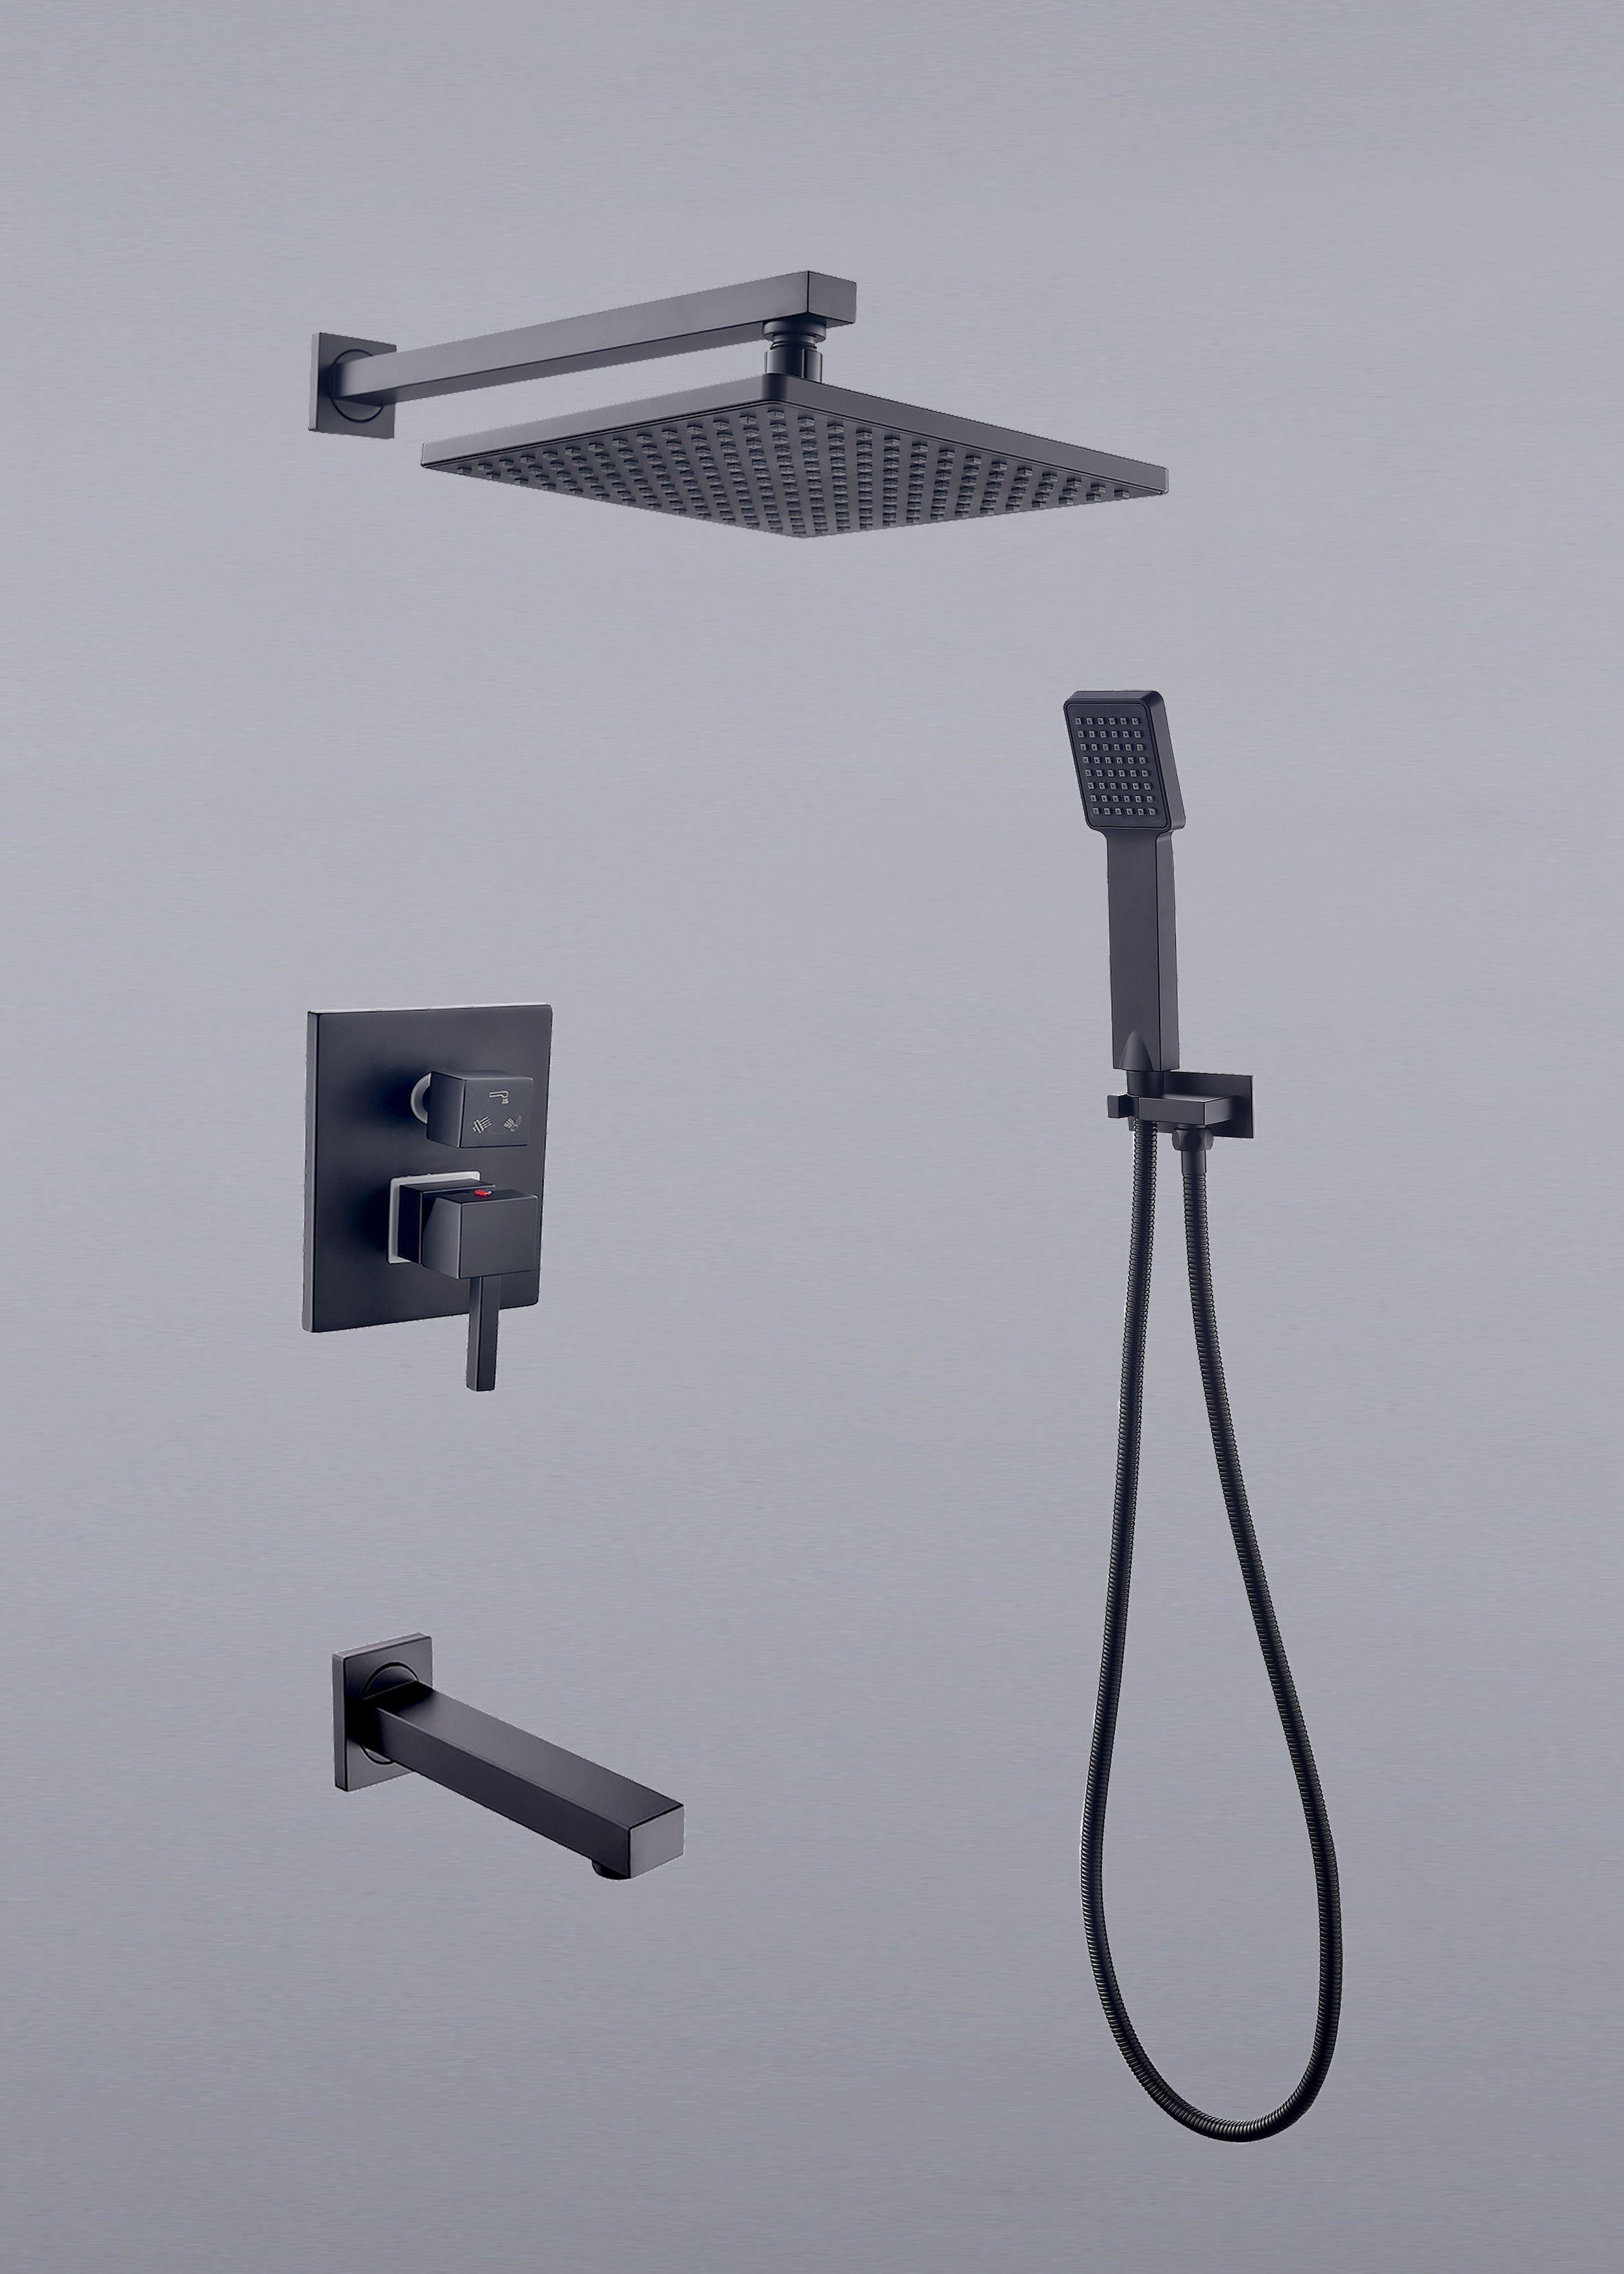 8 Inch Brass Bathroom Rainfall Shower Faucet Set Rough In Valve